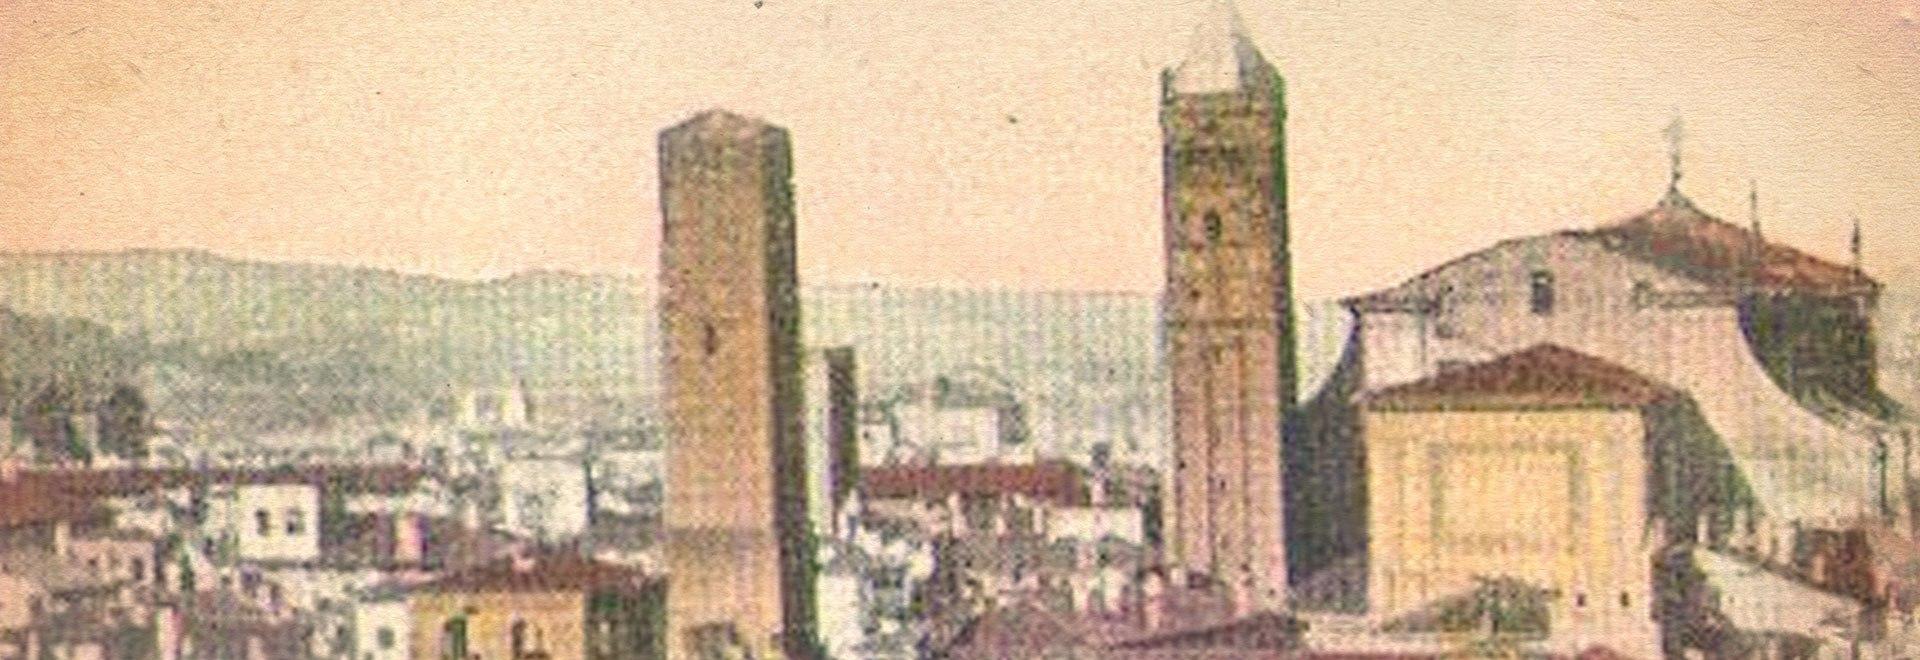 1964, il Bologna Paradiso